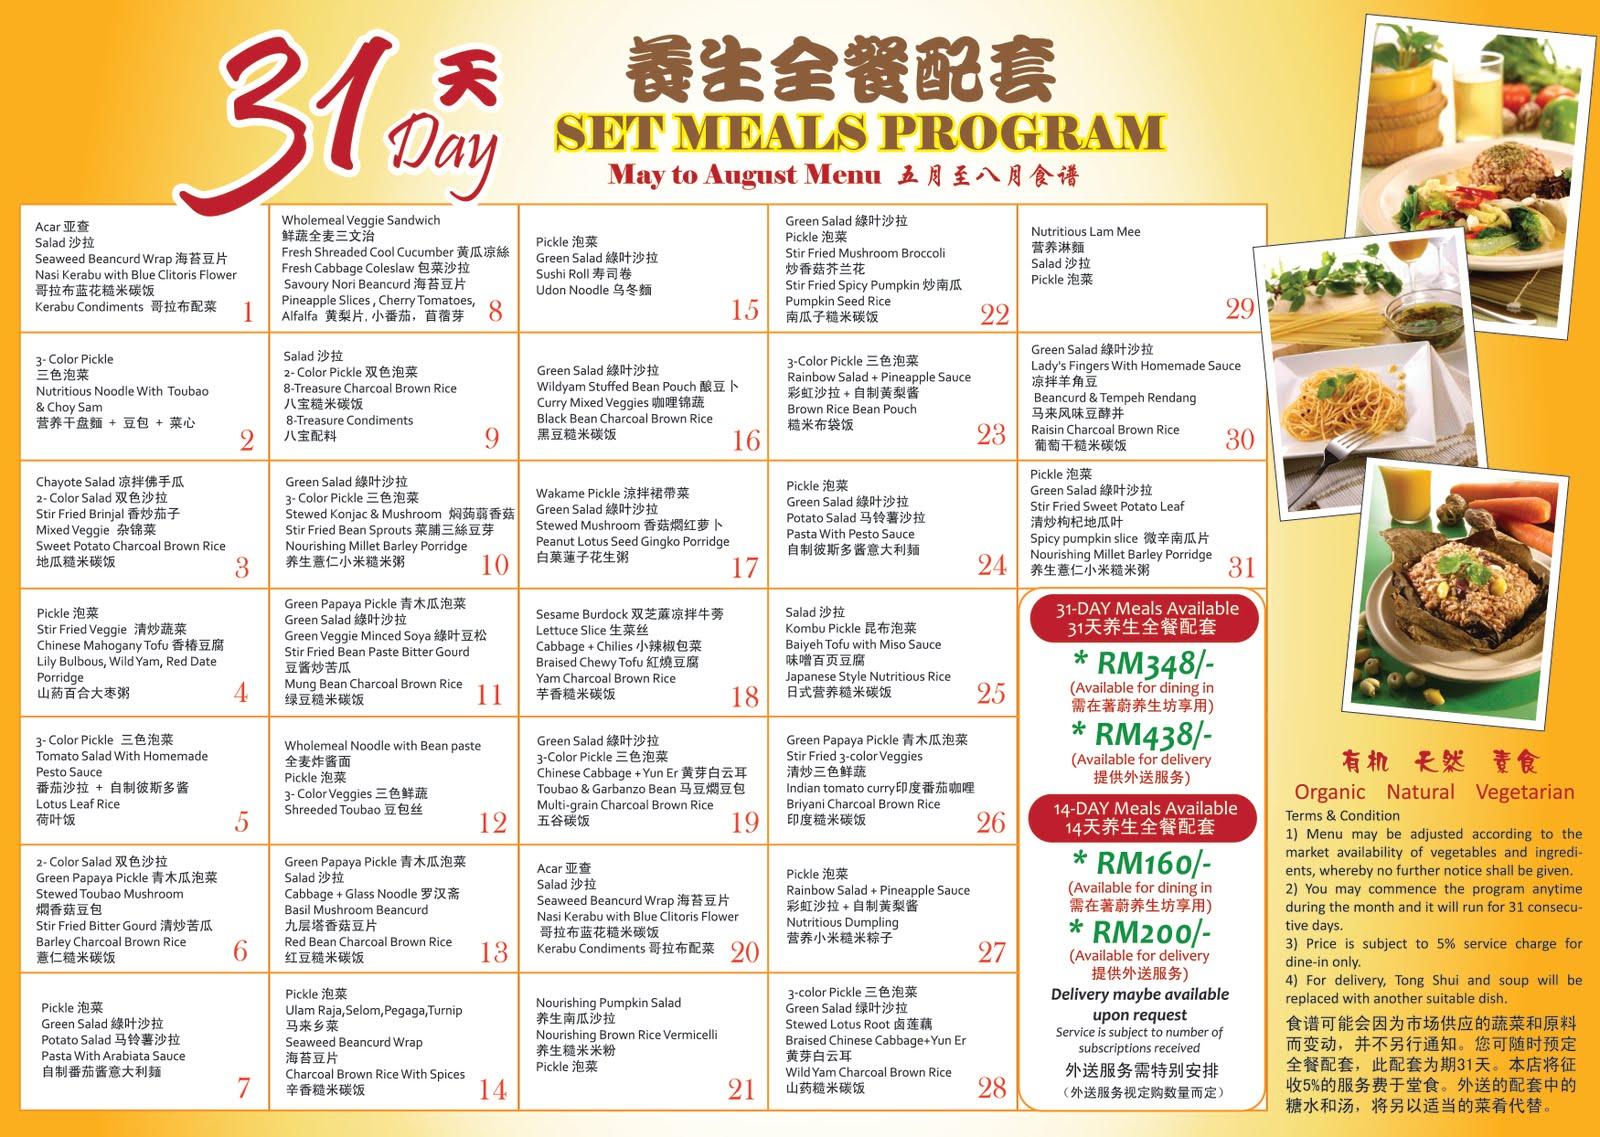 JUVE WELLNESS CENTER: New menu! New Life!